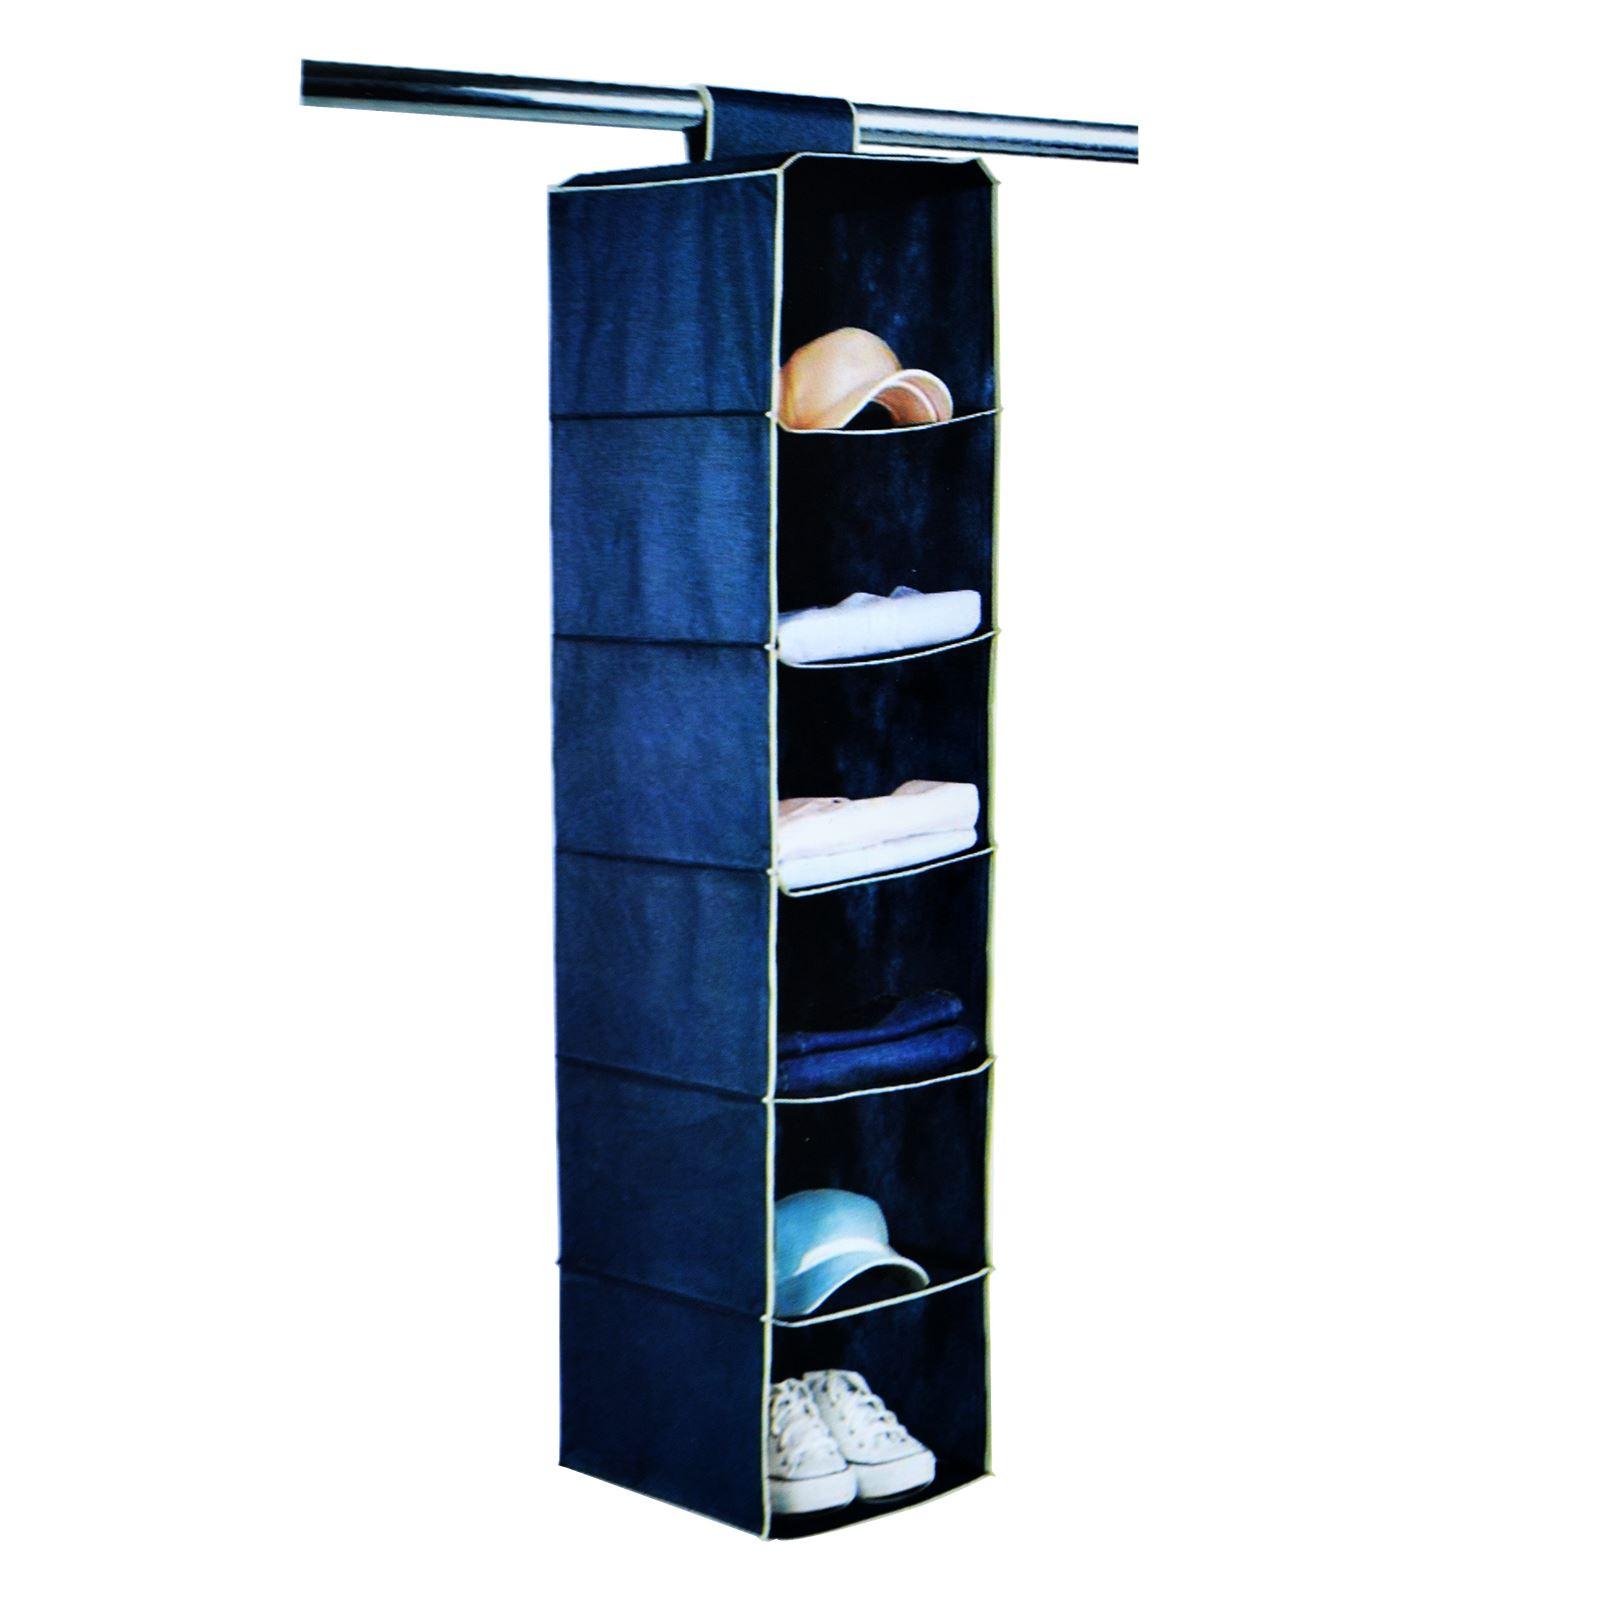 6 7 10 11 20 Shelf Pocket Hanging Storage Organiser Shoe